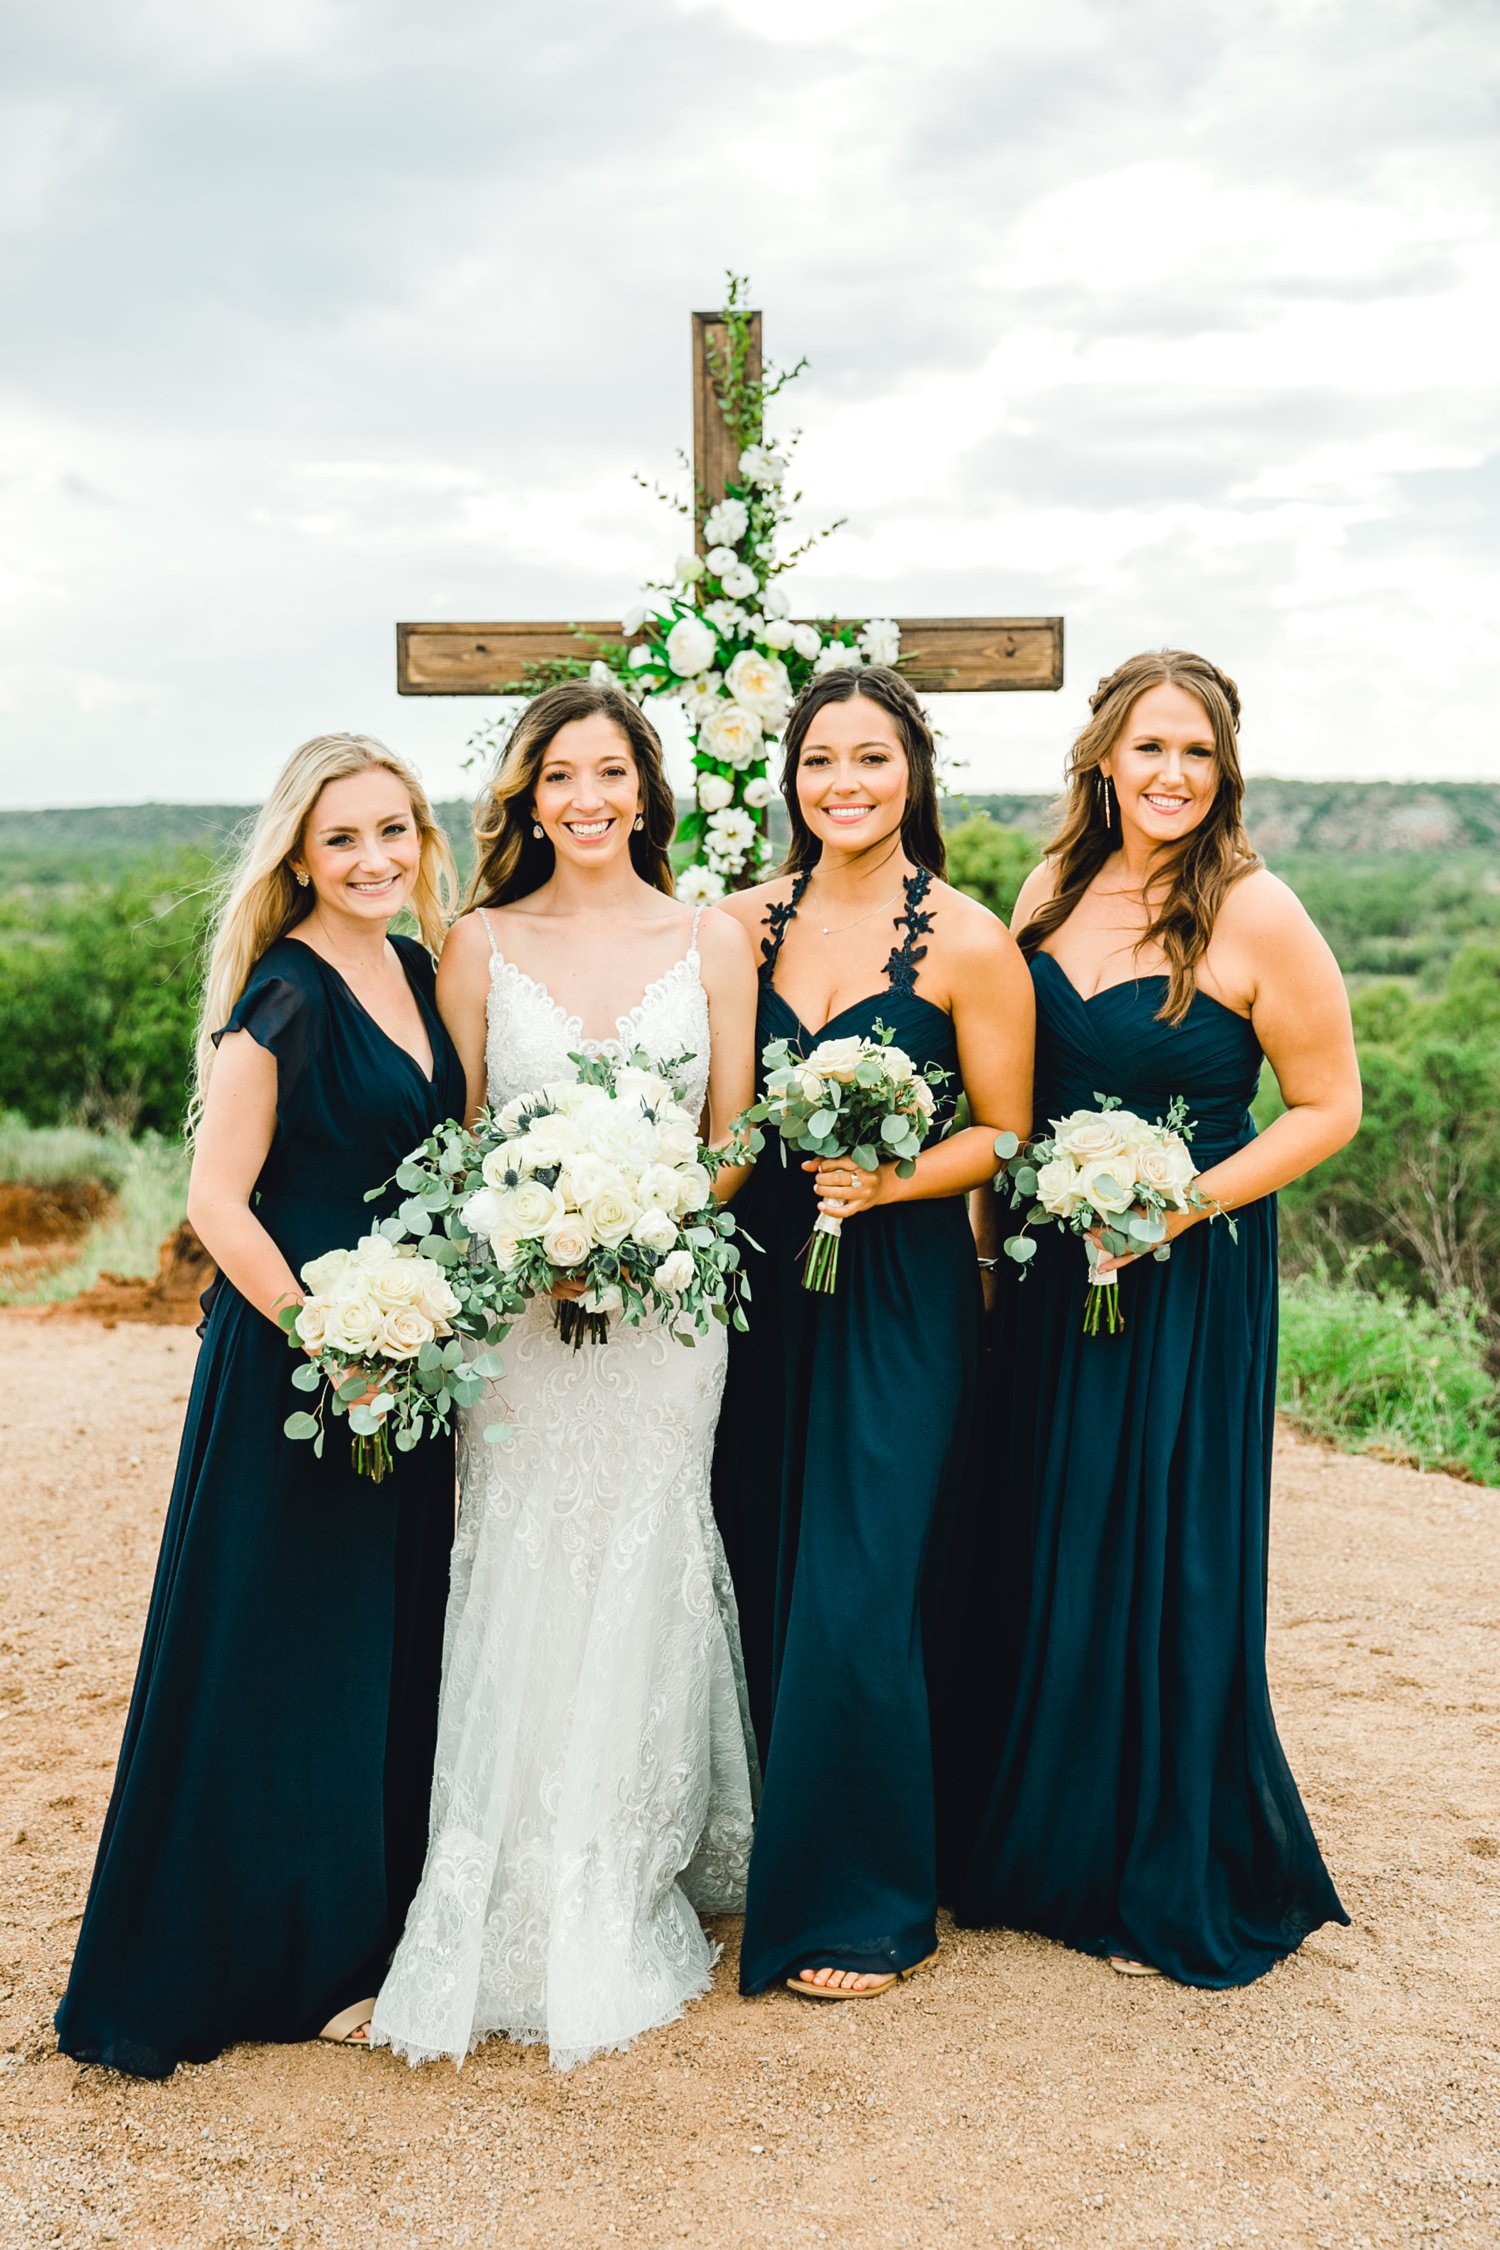 Ashley_John_English_Elegant_Texas_Wedding_Outdoors_Ranch_Caprock_Winery_ALLEEJ_0043.jpg